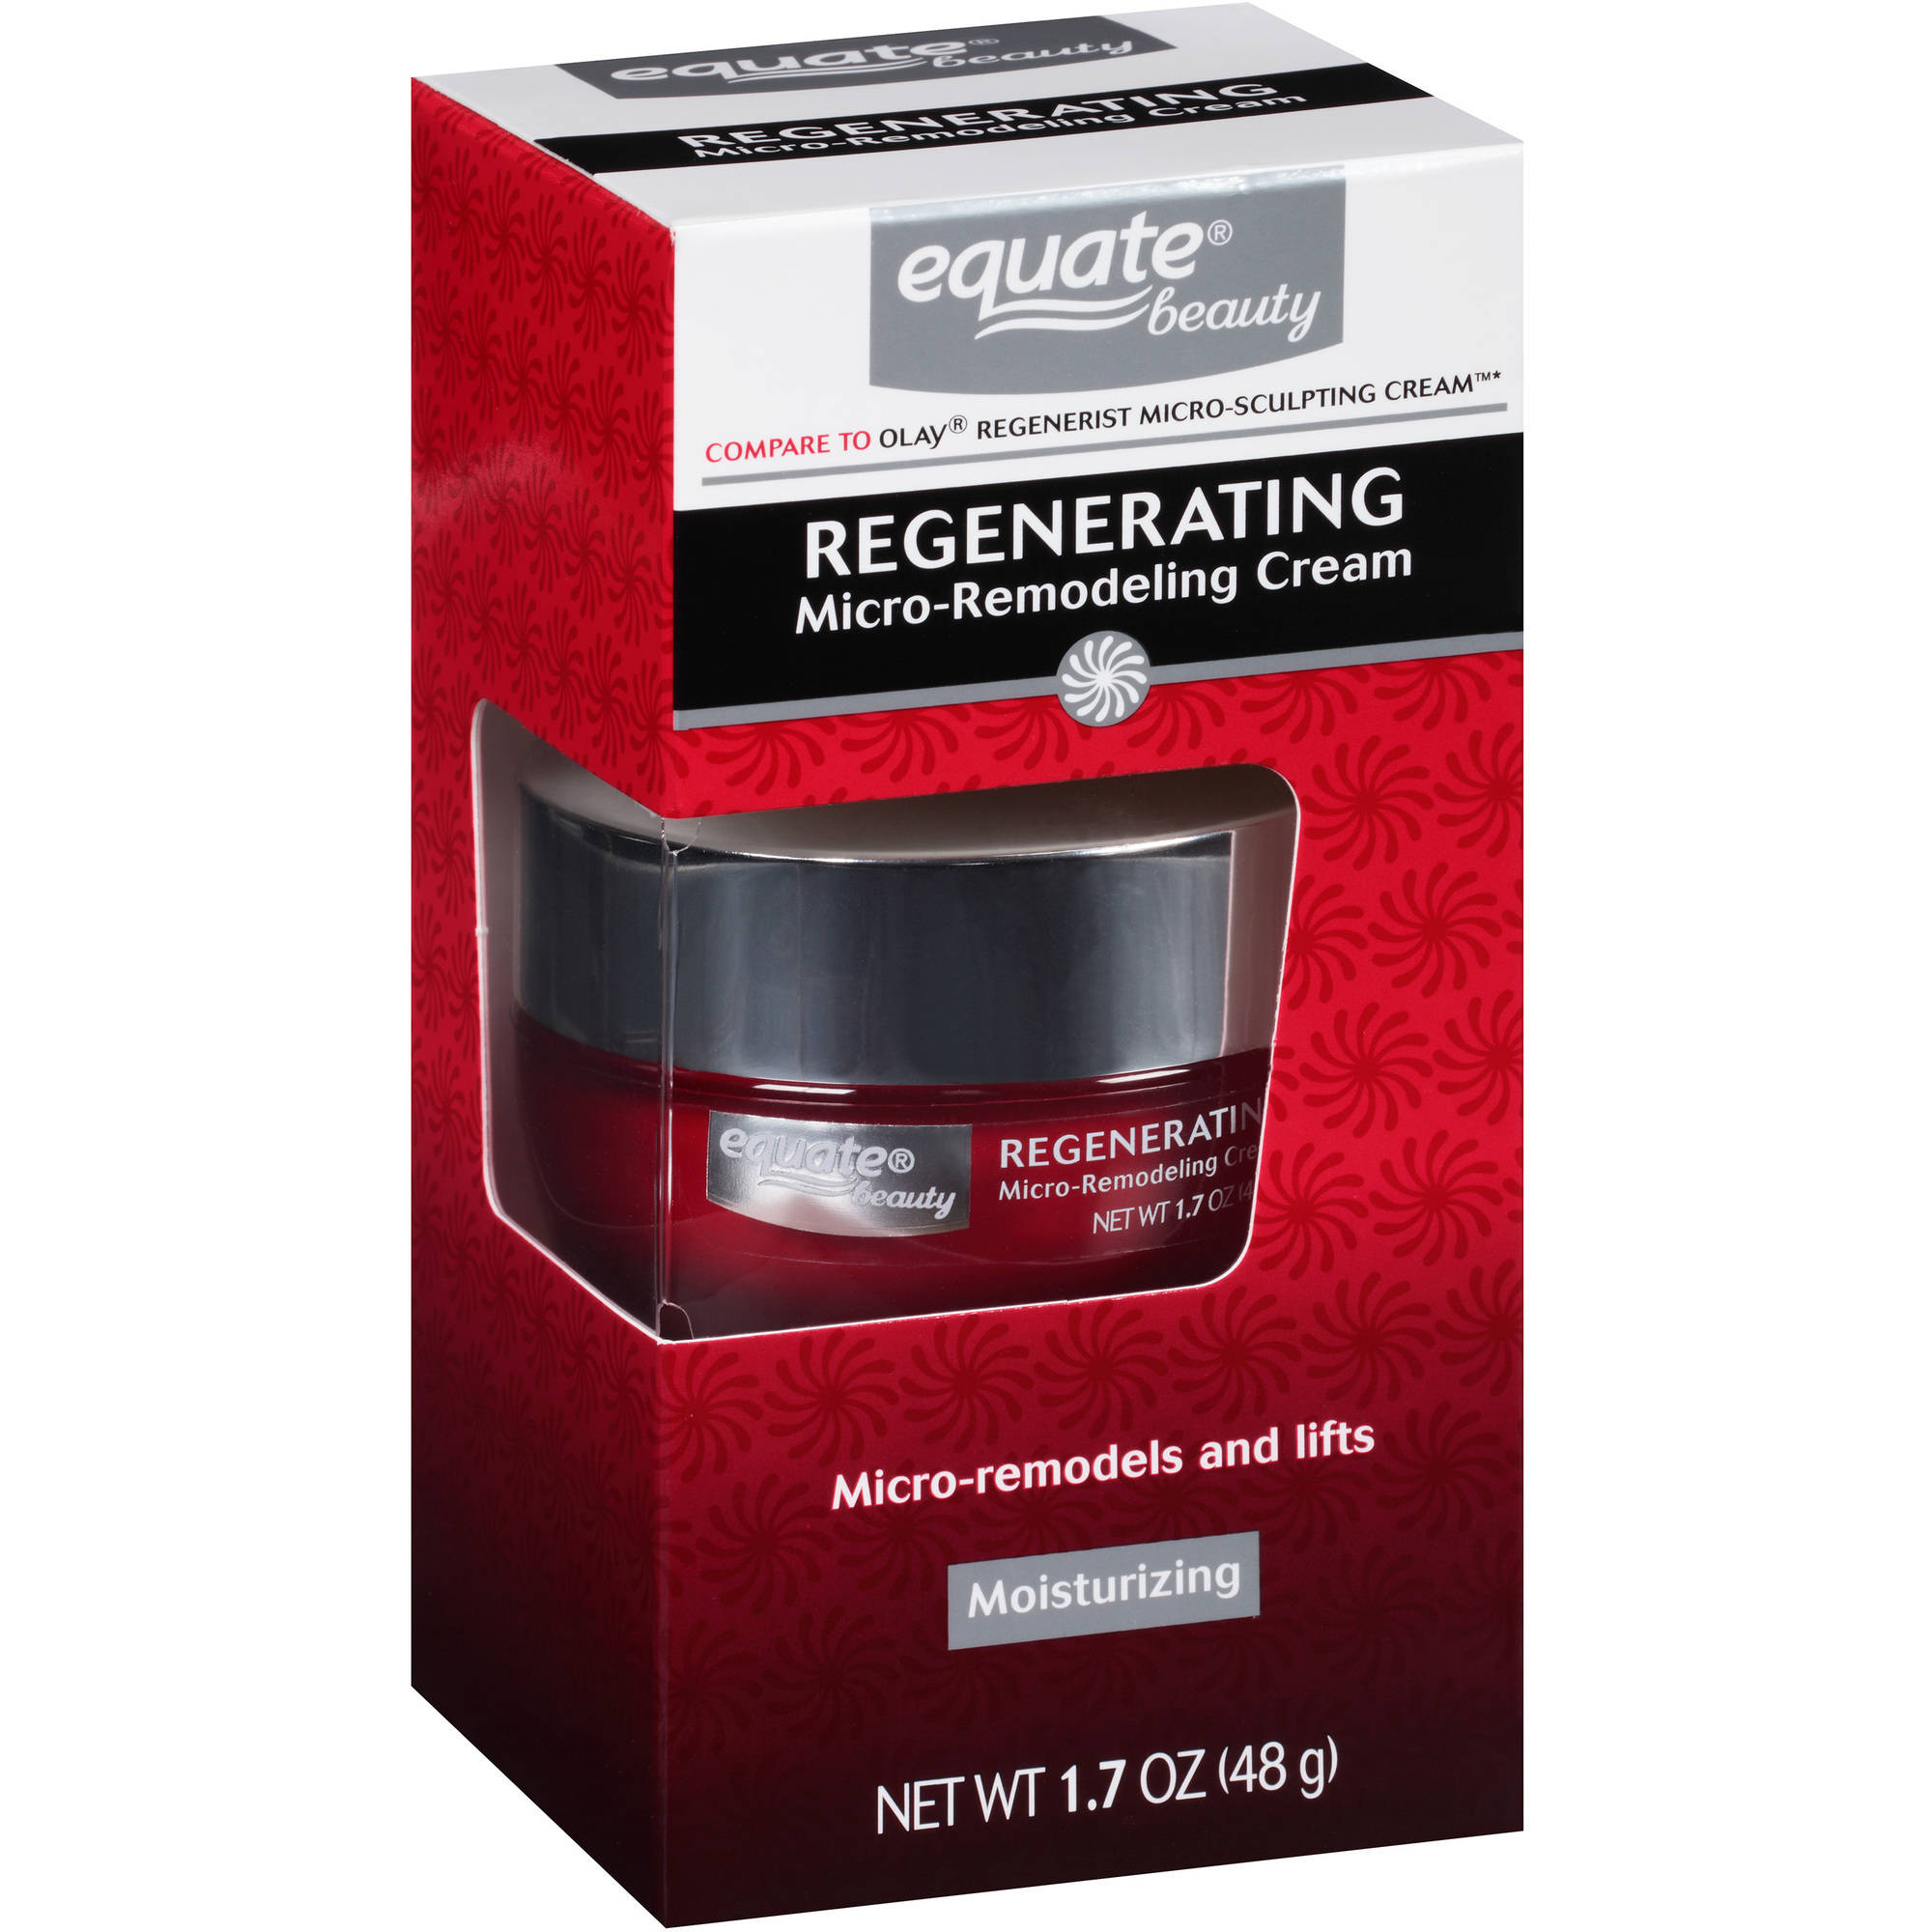 Equate Rejuvenating Micro-Remodeling Cream, 1.7 oz